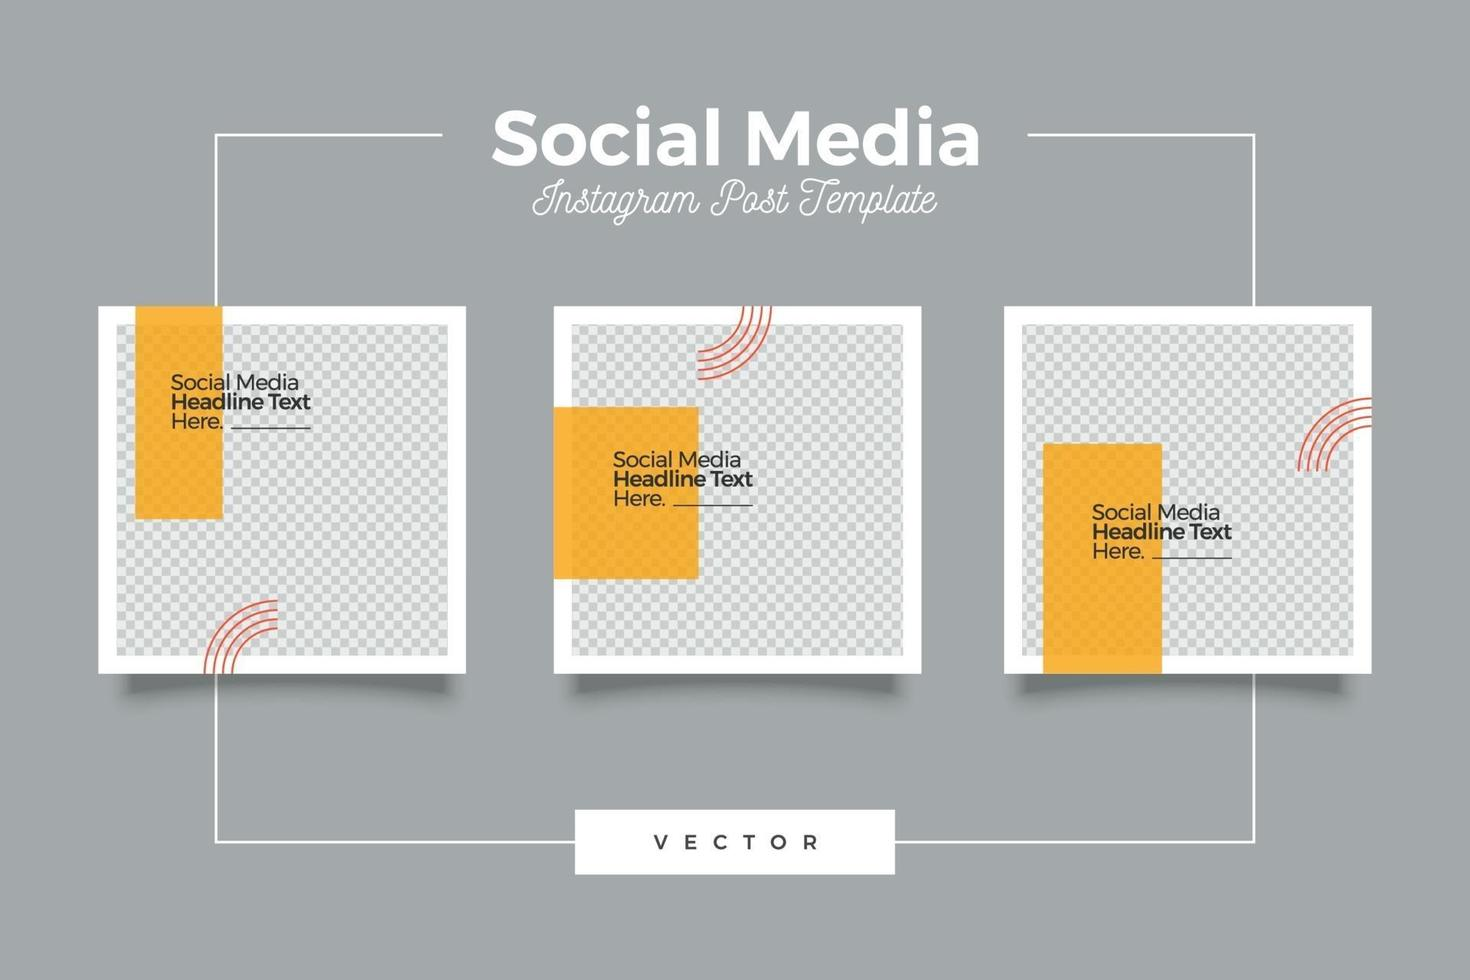 conjunto de modelos de mídia social limpa e moderna vetor